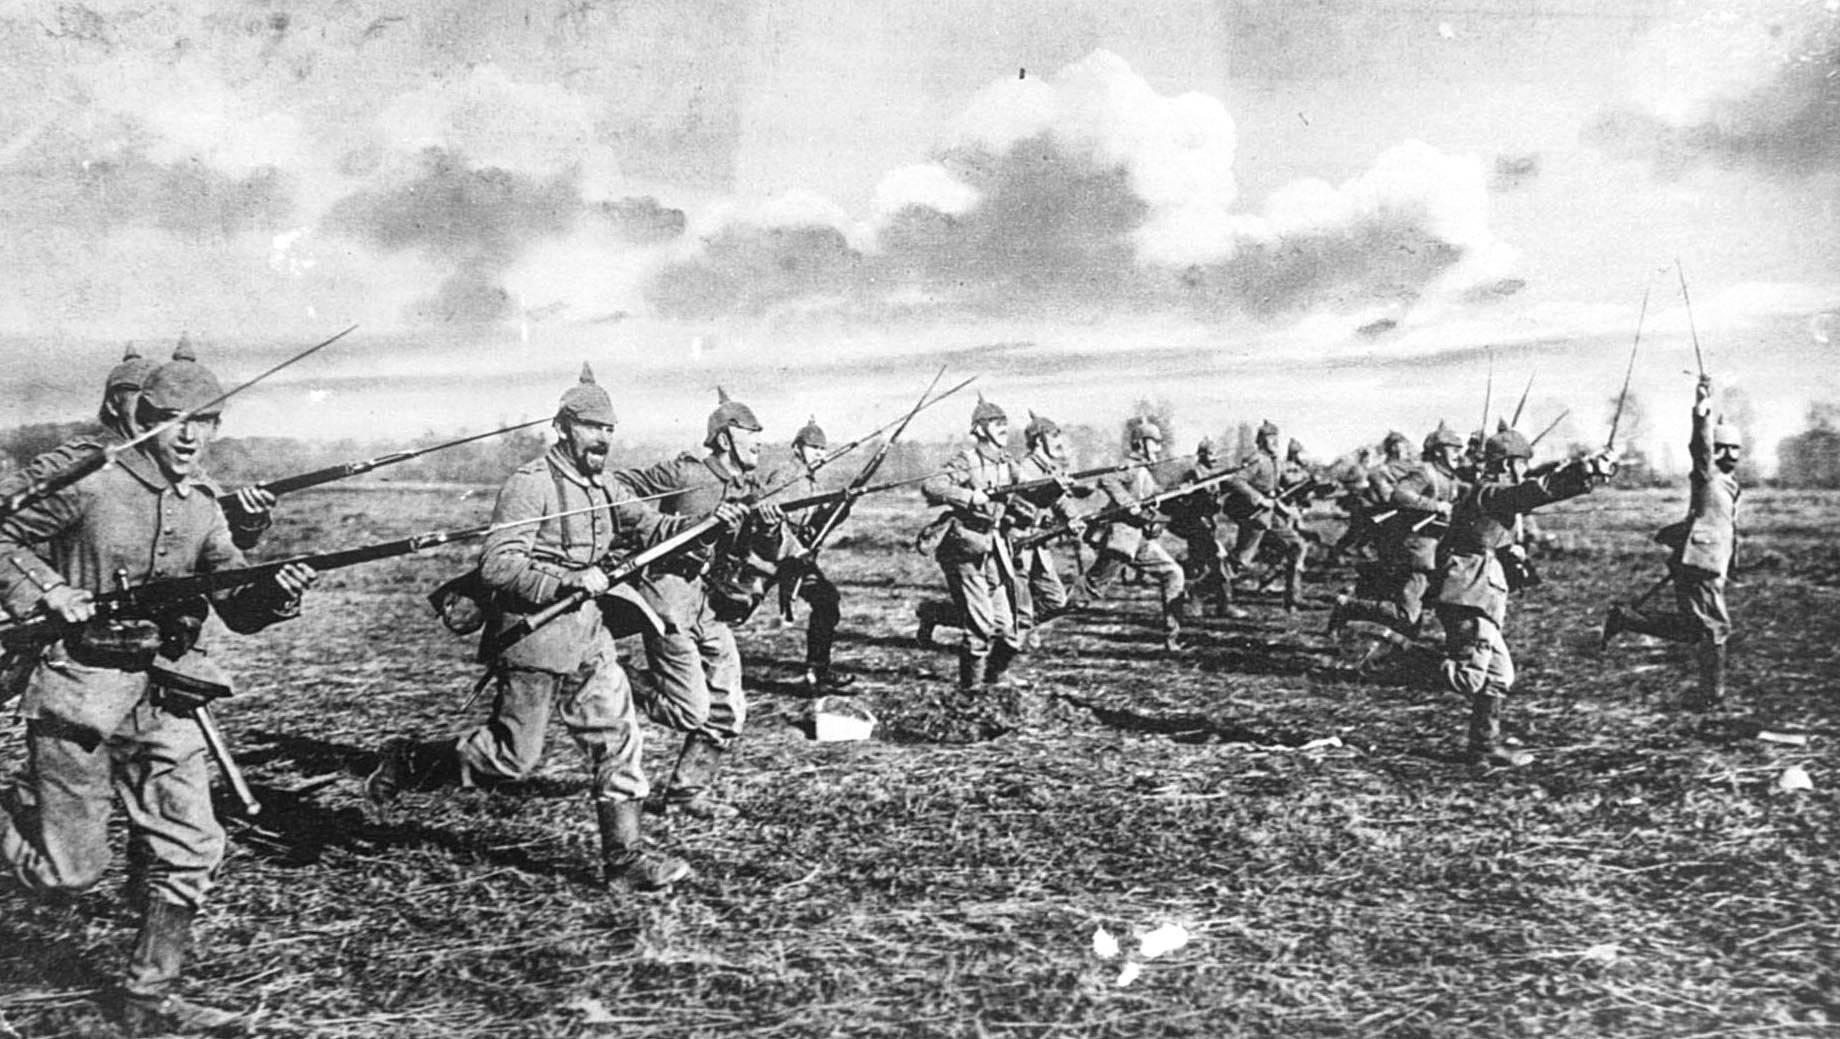 VARIOUS - WORLD WAR I